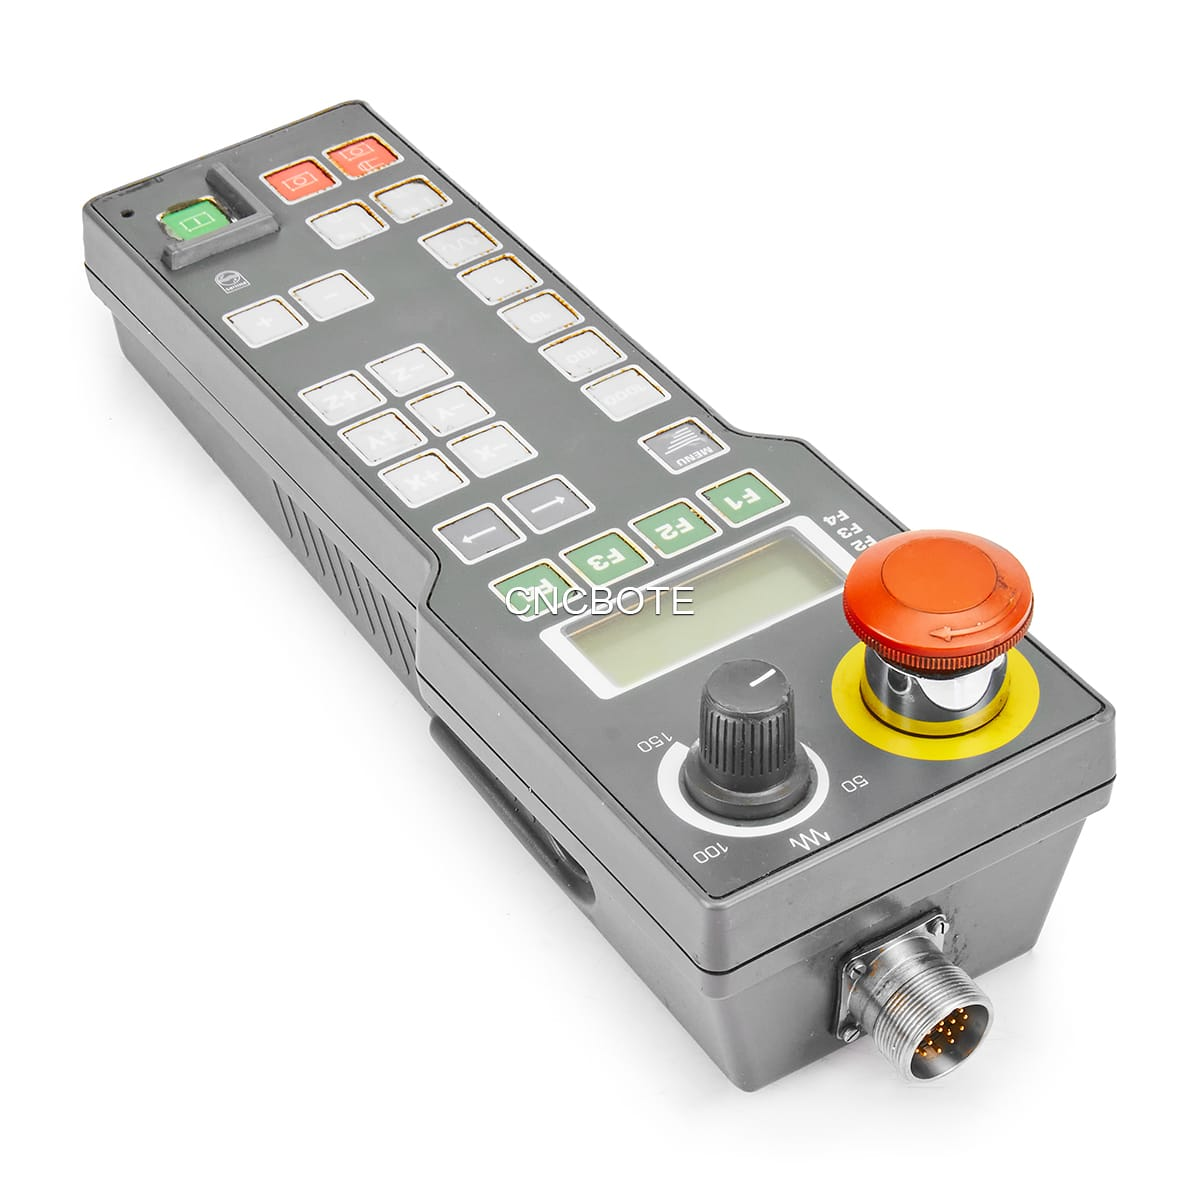 Philips 4022 228 3051.1 RCU Handrad